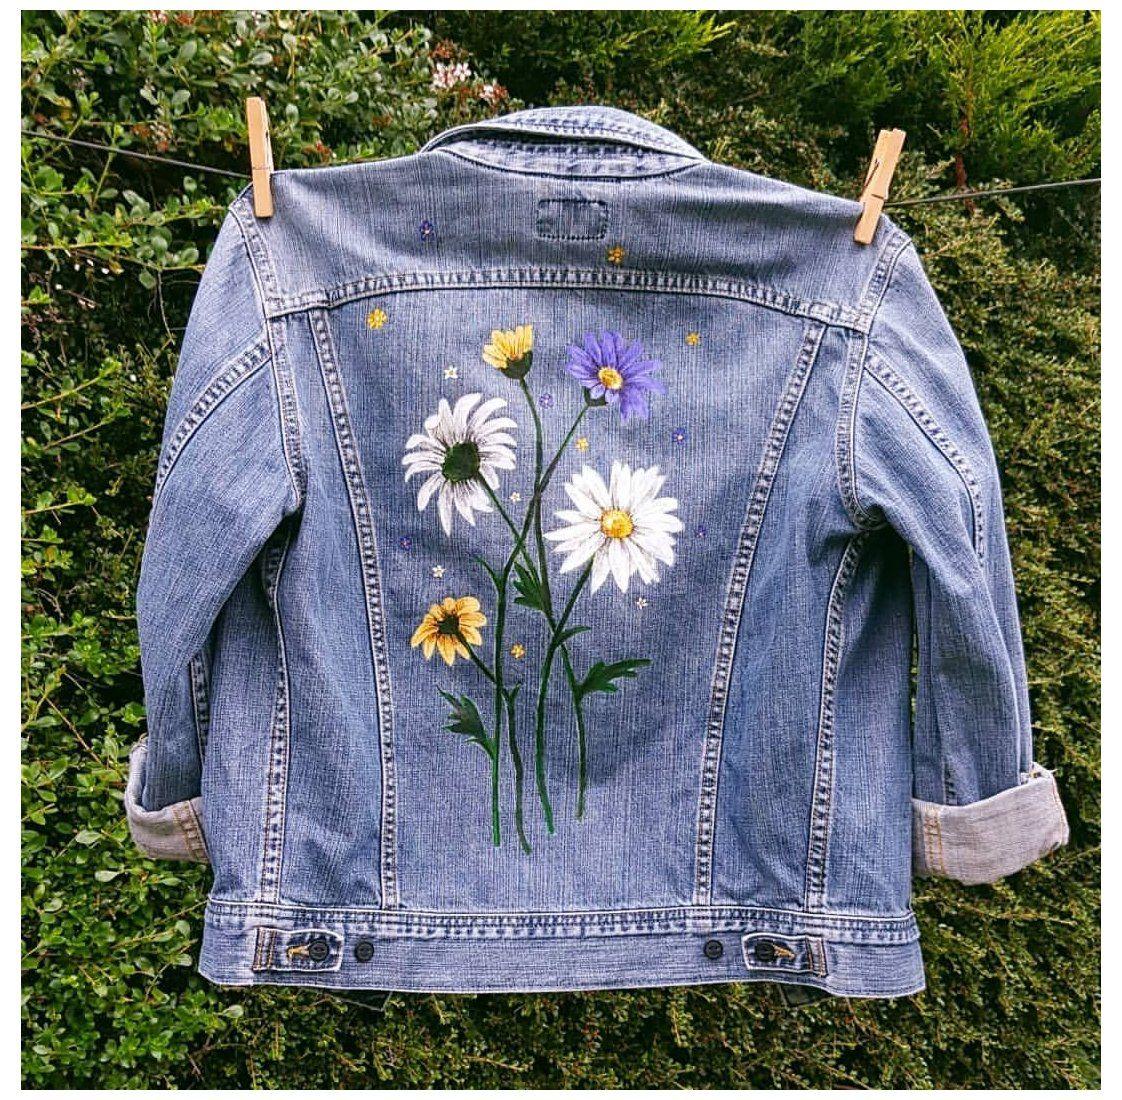 Behind The Scenes By Danibee Arts The Custom Movement Custom Denim Jacket Ideas Customdenimjacketid In 2021 Painted Clothes Painted Clothes Diy Diy Denim Jacket [ 1100 x 1122 Pixel ]